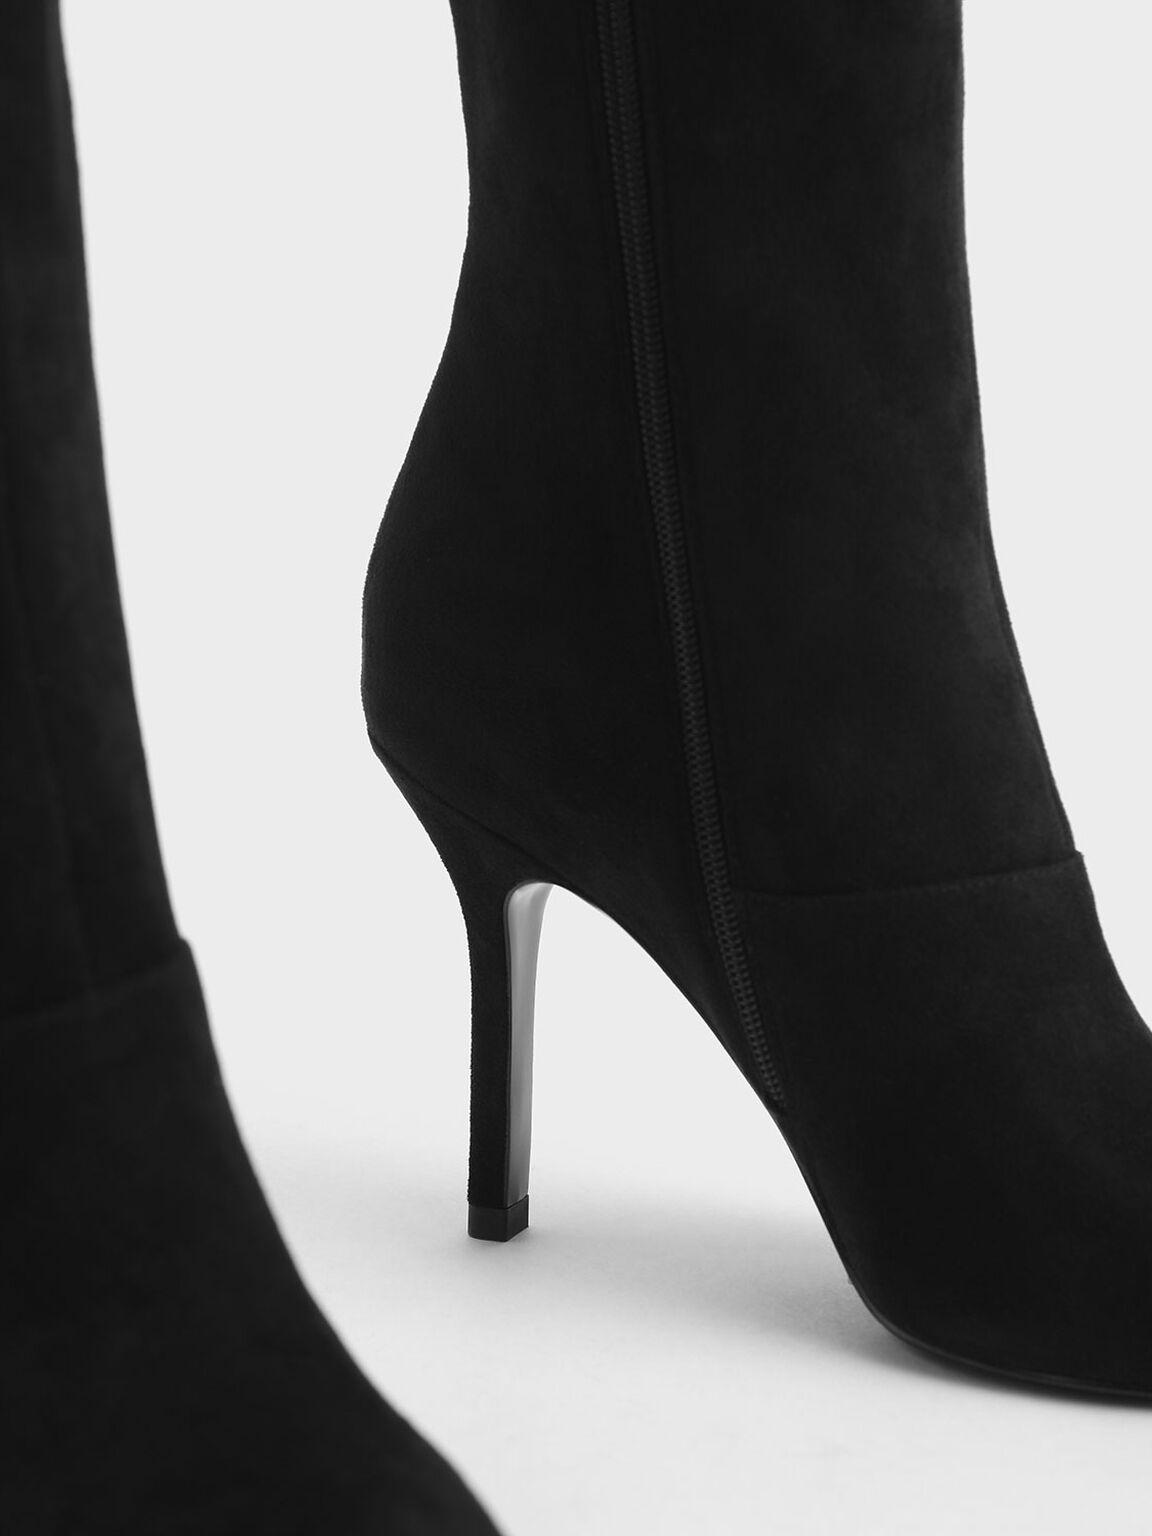 Textured Knee High Boots, Black Textured, hi-res